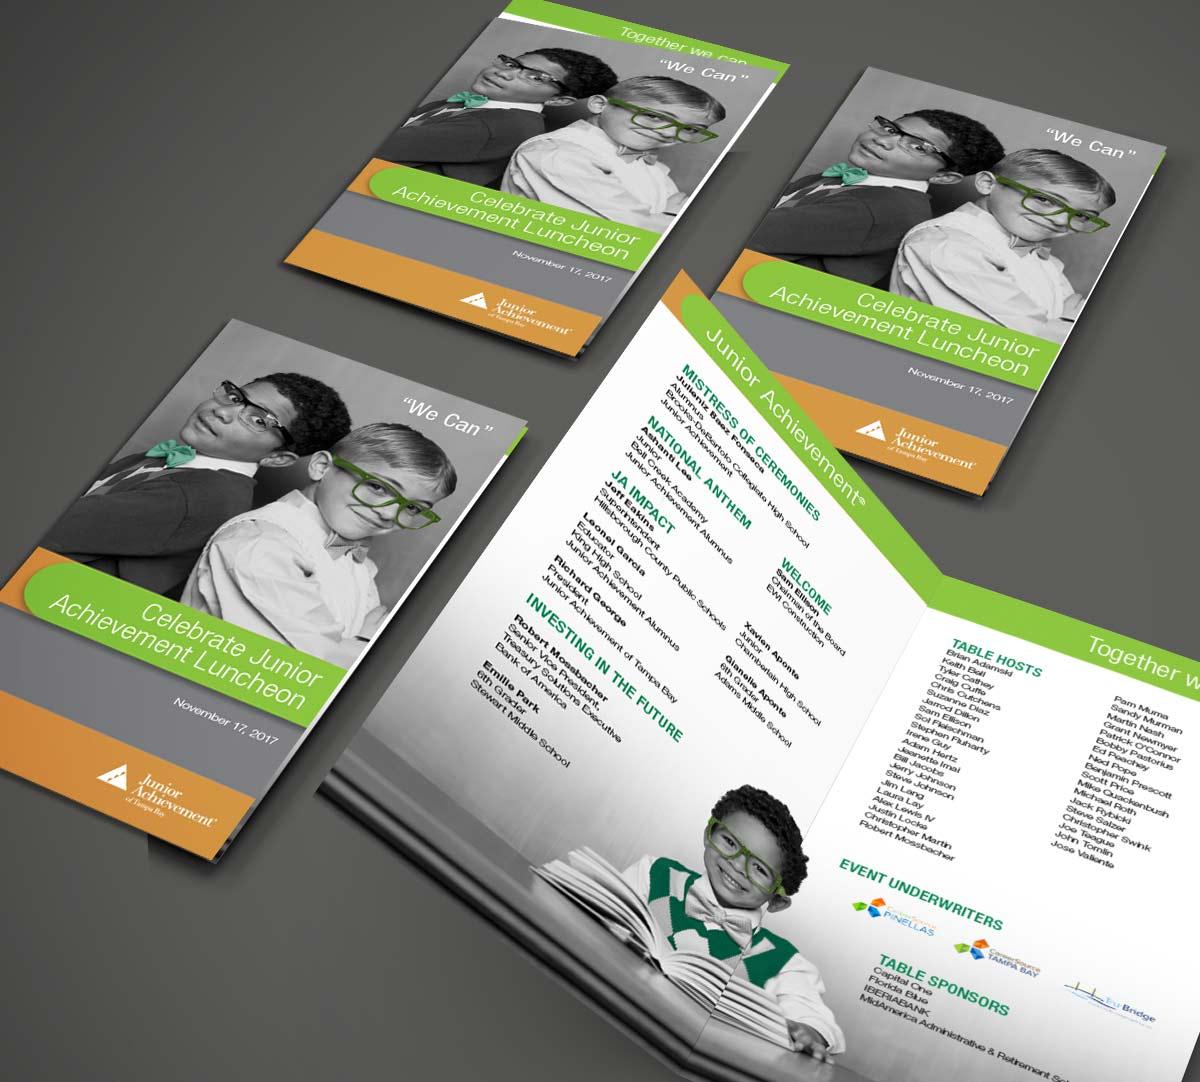 jared-lantzman-largo-clearwater-graphic-web-design11